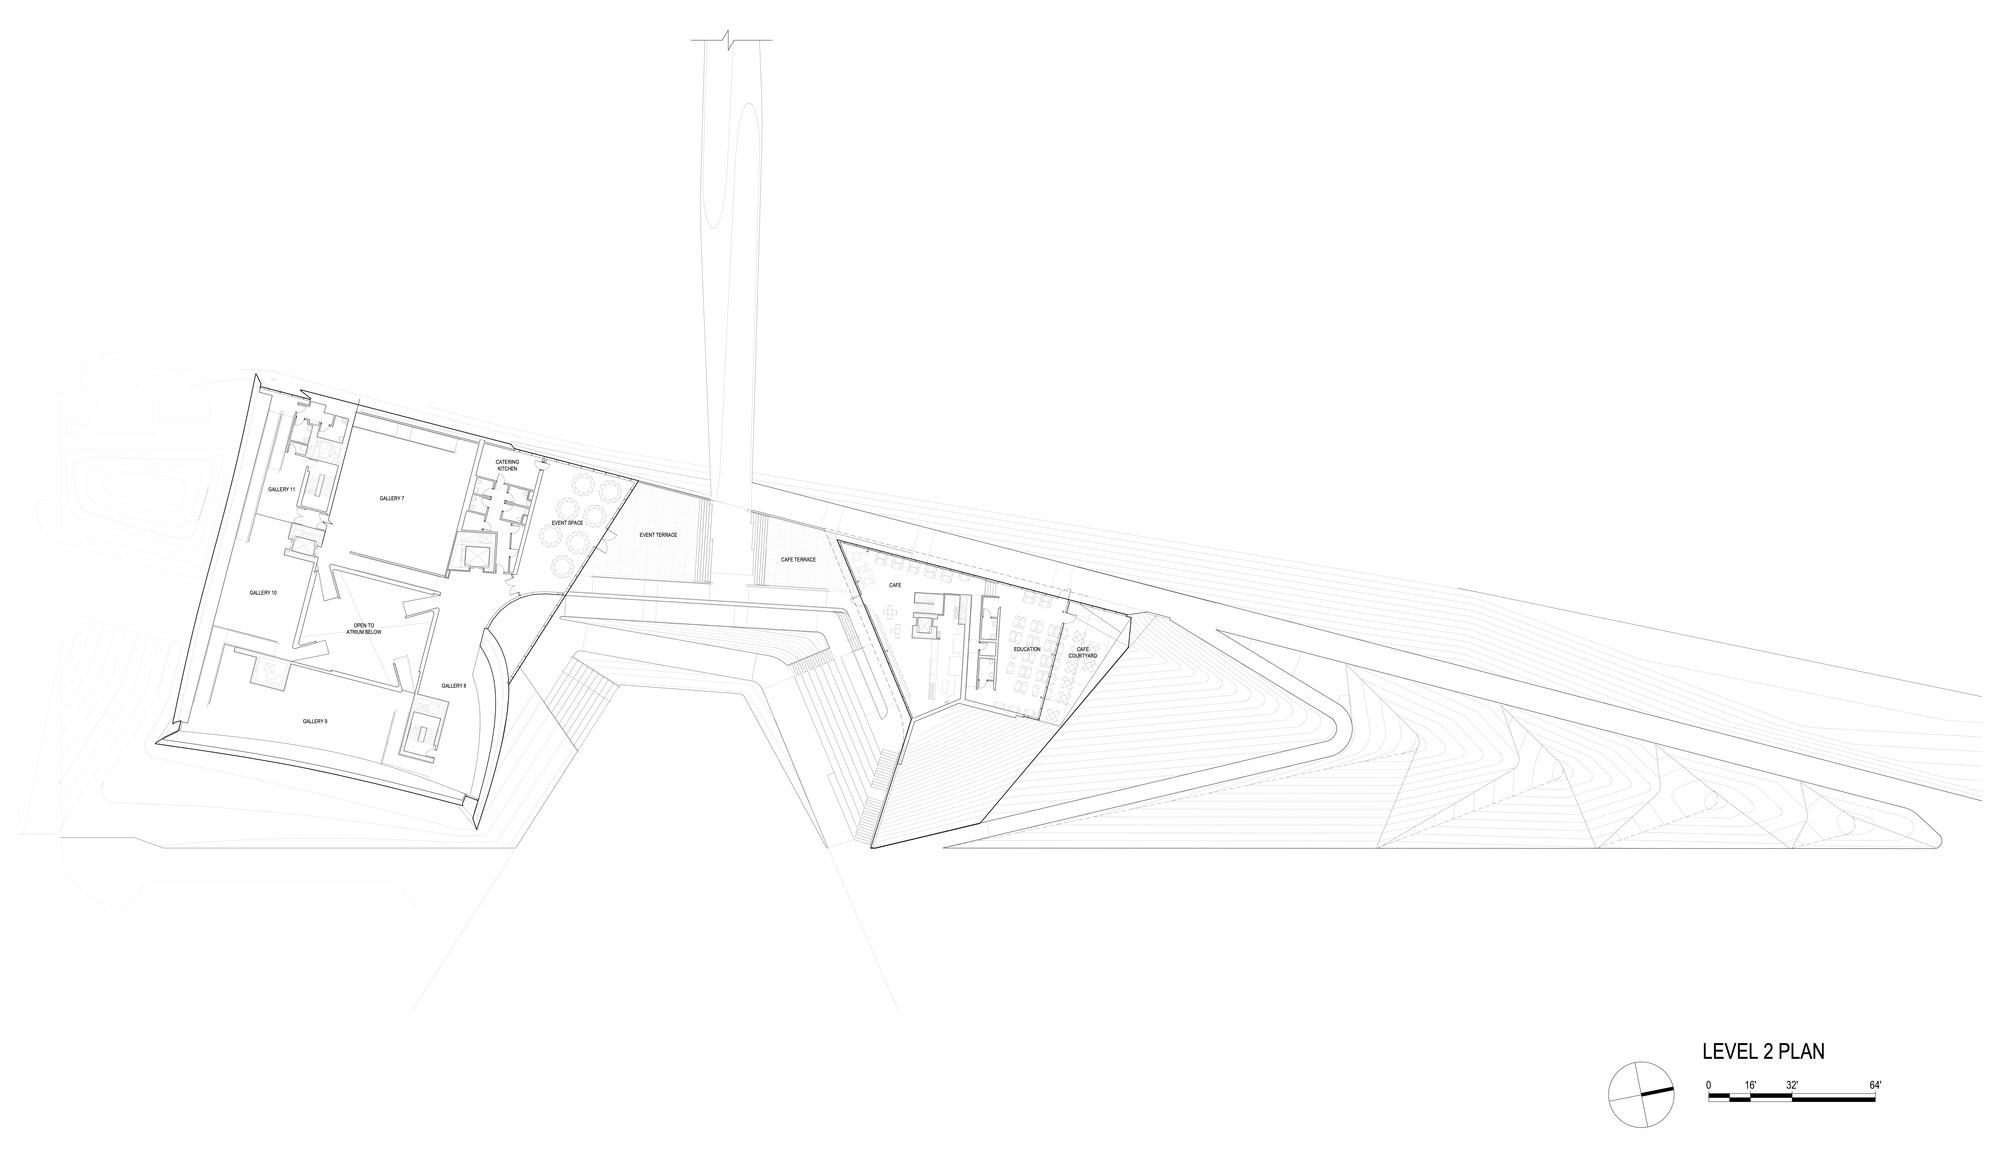 m2 _USOPM_Plans_3.jpg